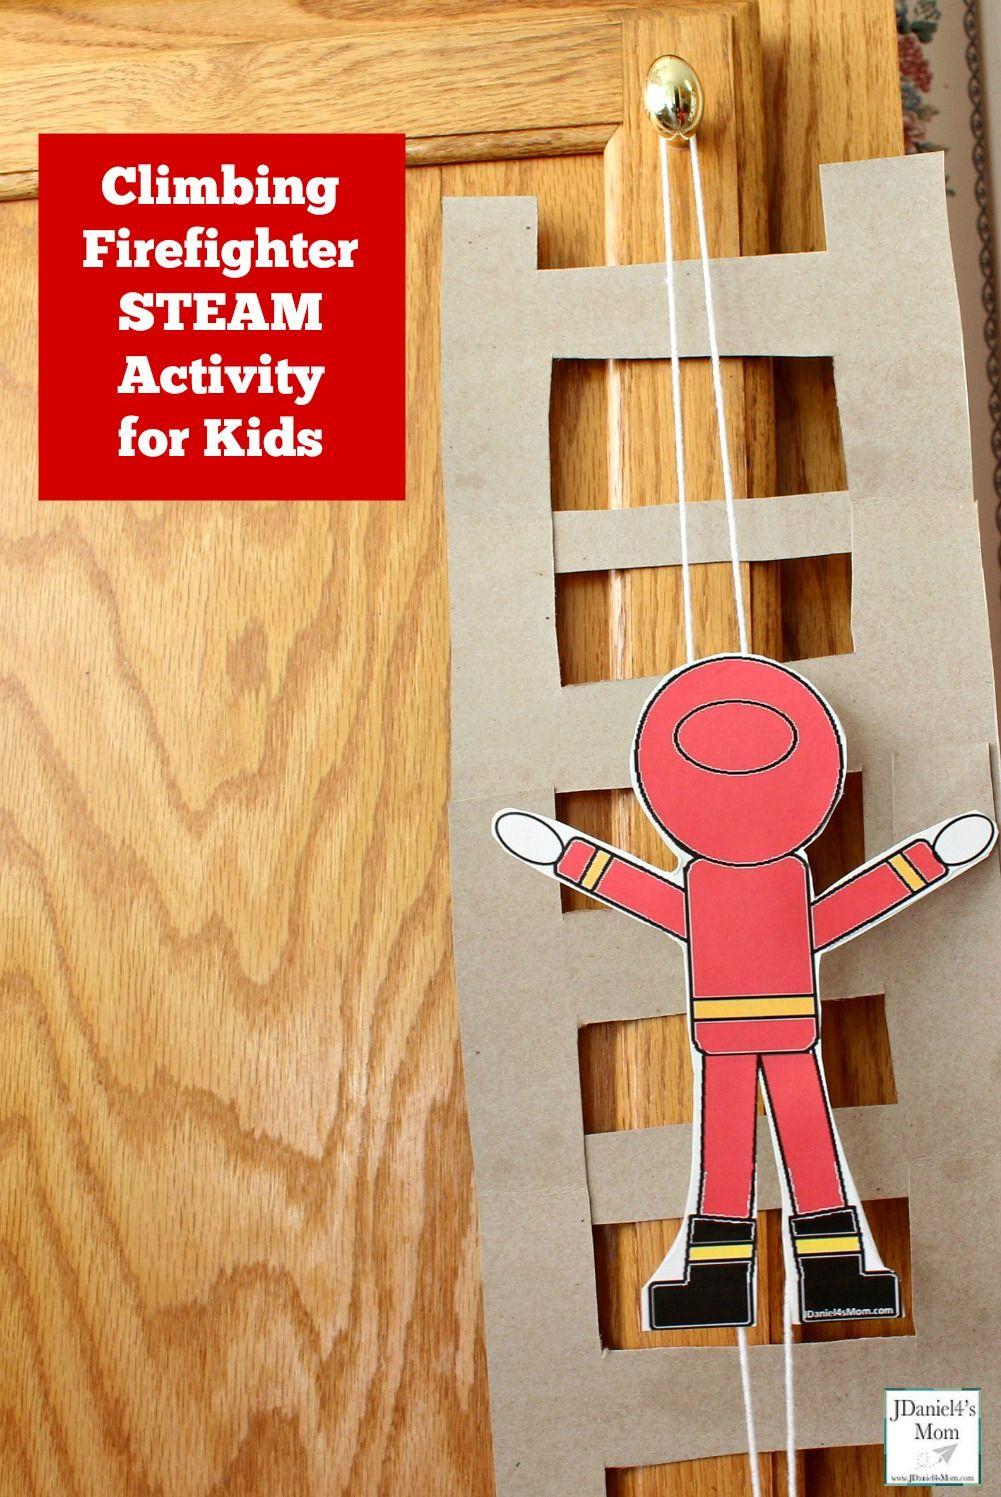 Climbing Firefighter STEAM Activity for Kids Fire safety